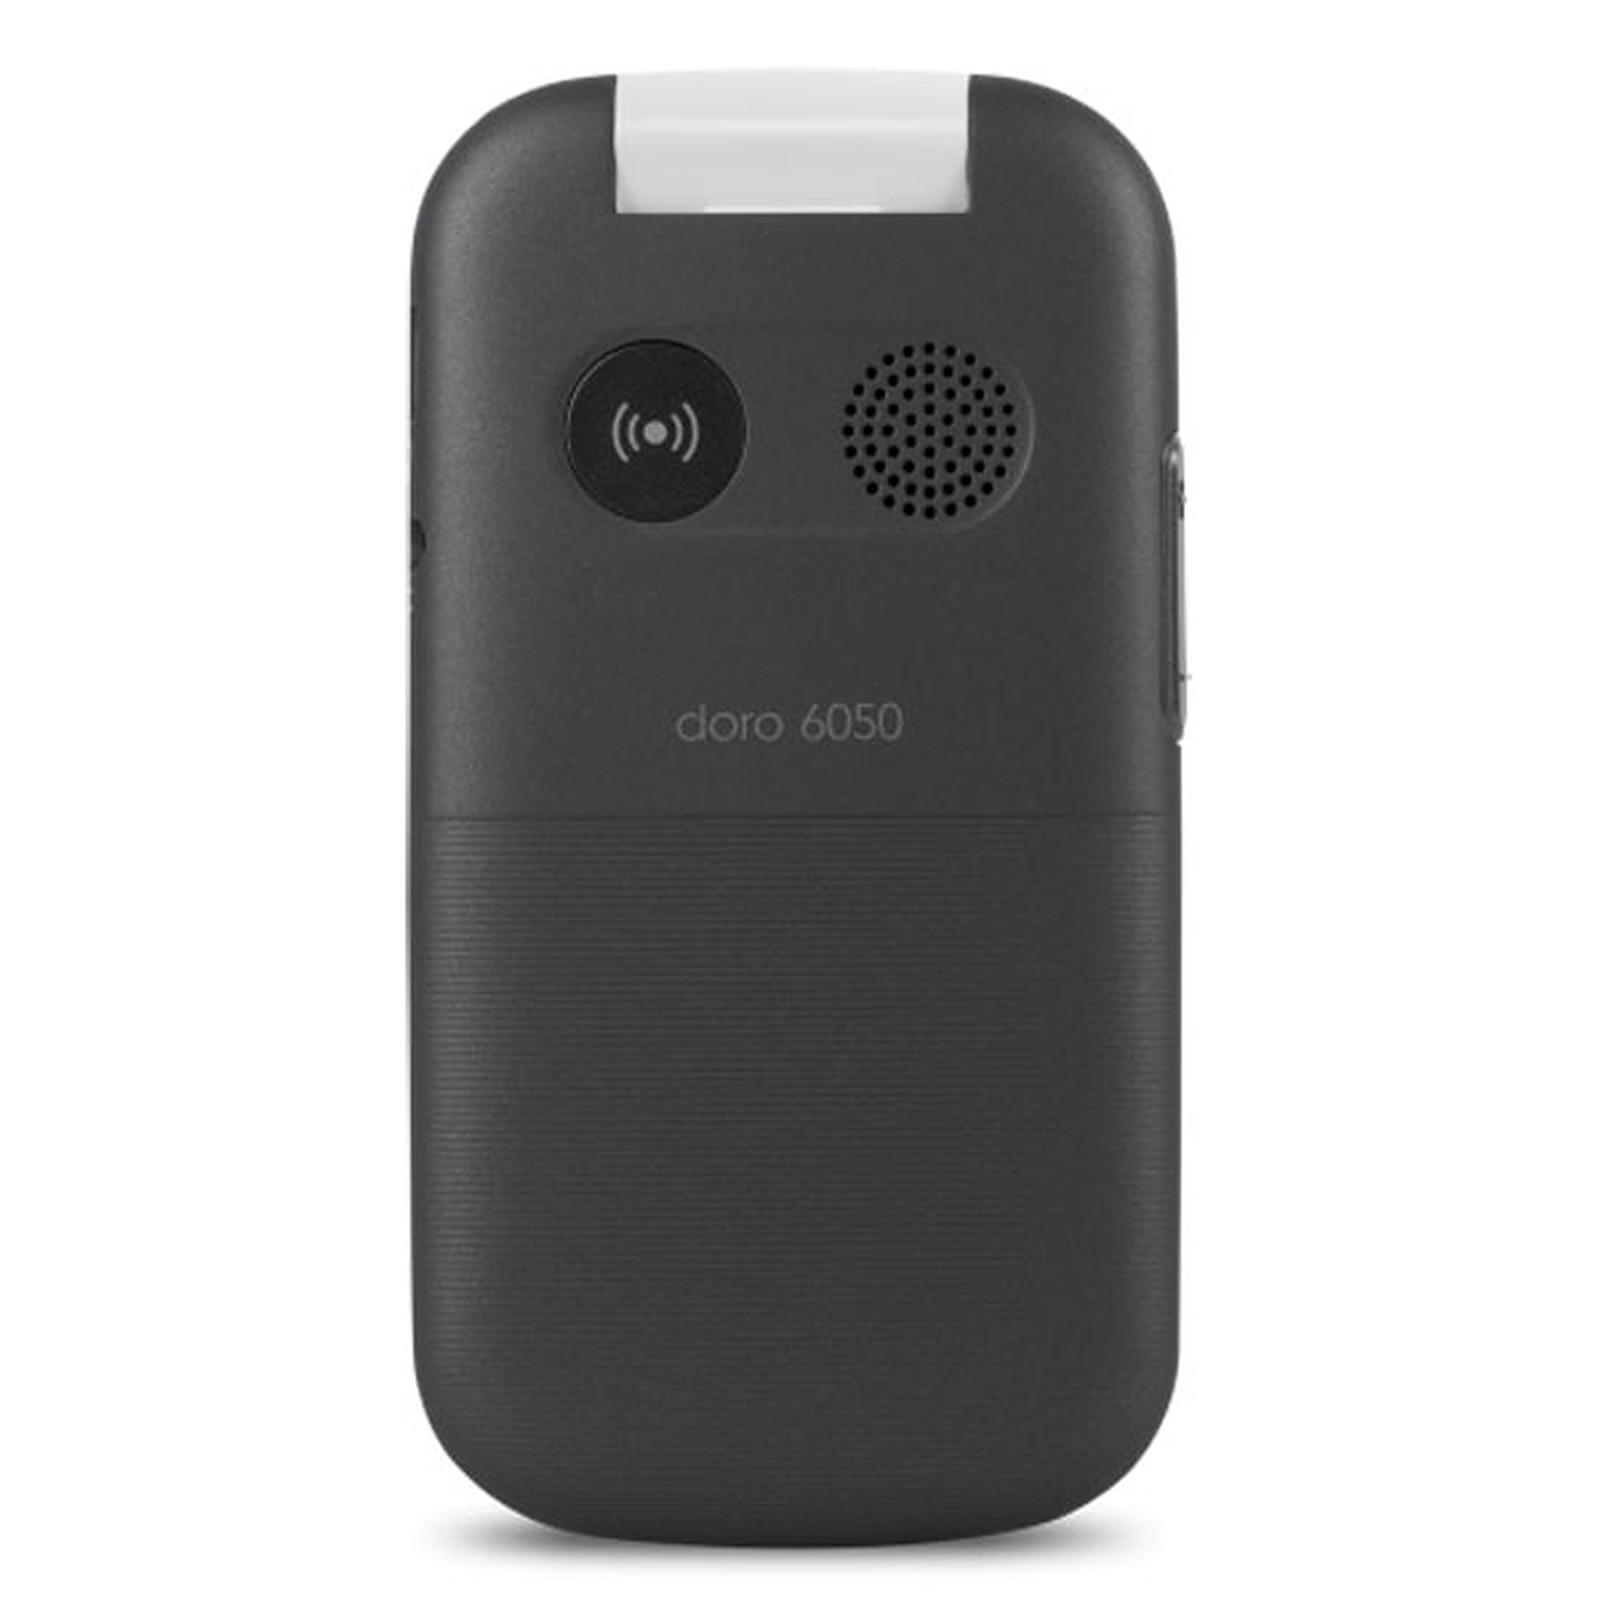 Doro 6050 Graphite Blanc - Mobile   smartphone Doro sur LDLC.com ce35fac4ae42